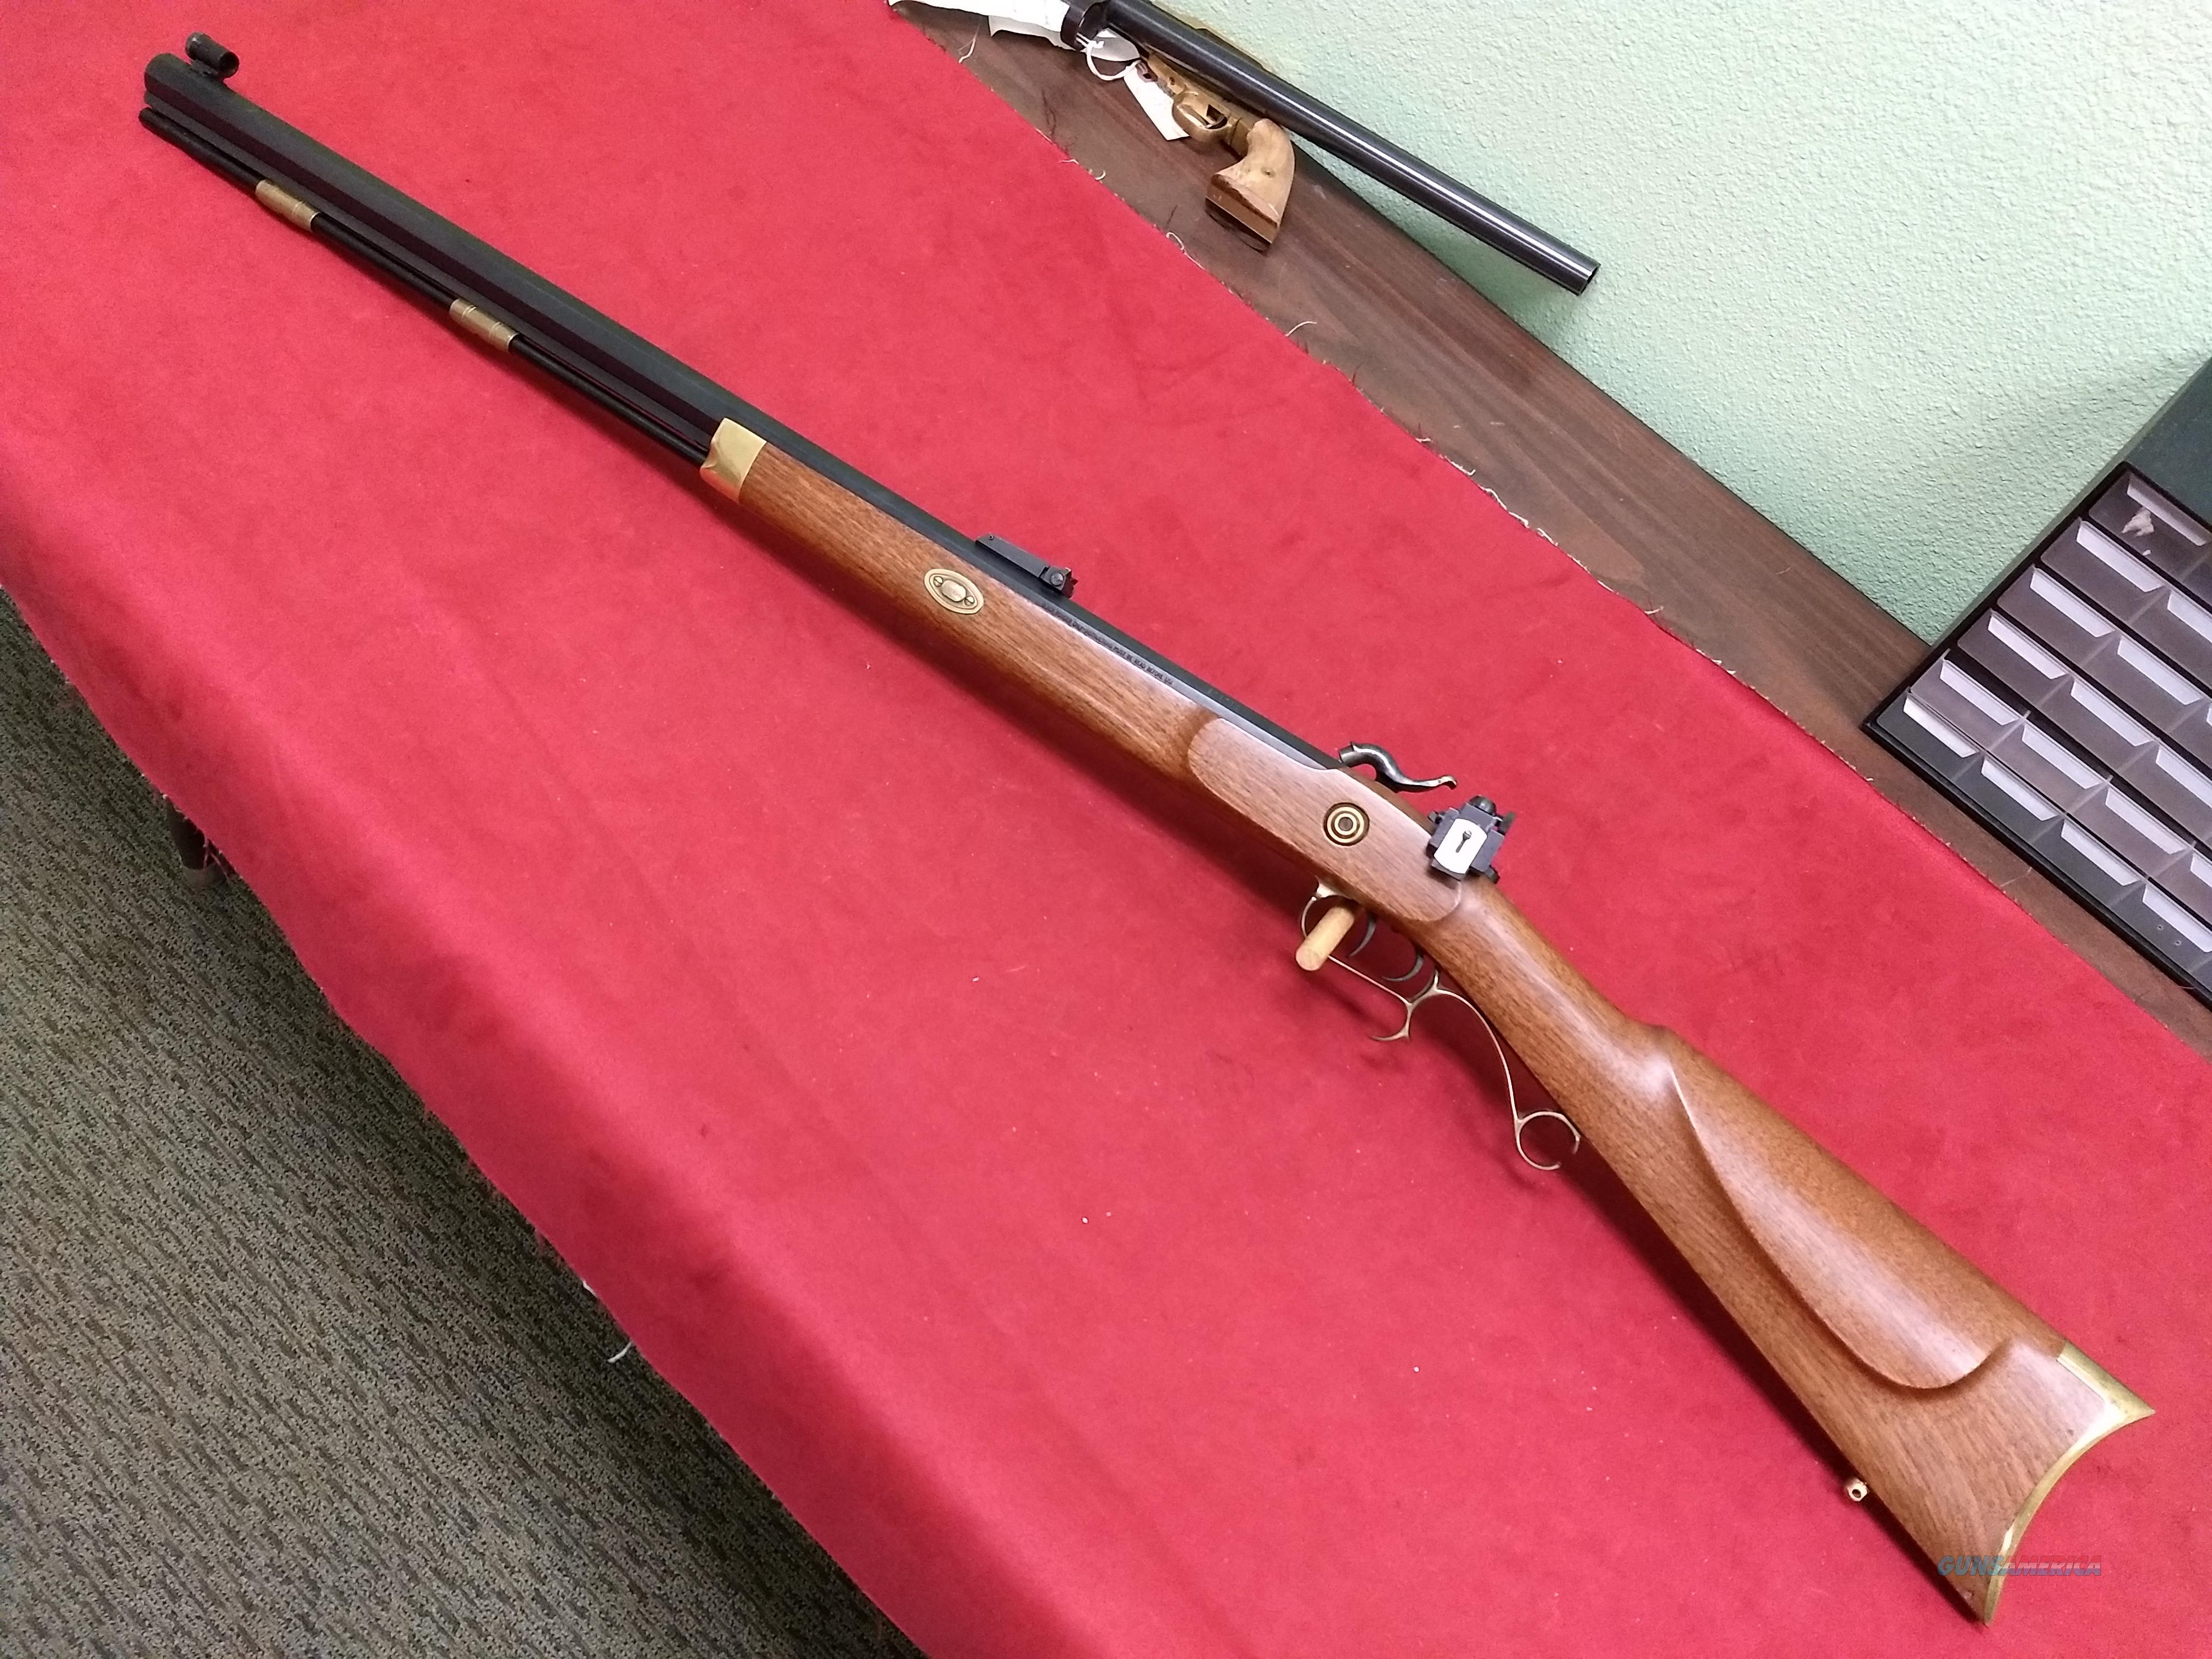 T/C Hawken Style Muzzleloader, .50 Caliber, Peep Sights  Guns > Rifles > Thompson Center Muzzleloaders > Hawken Style